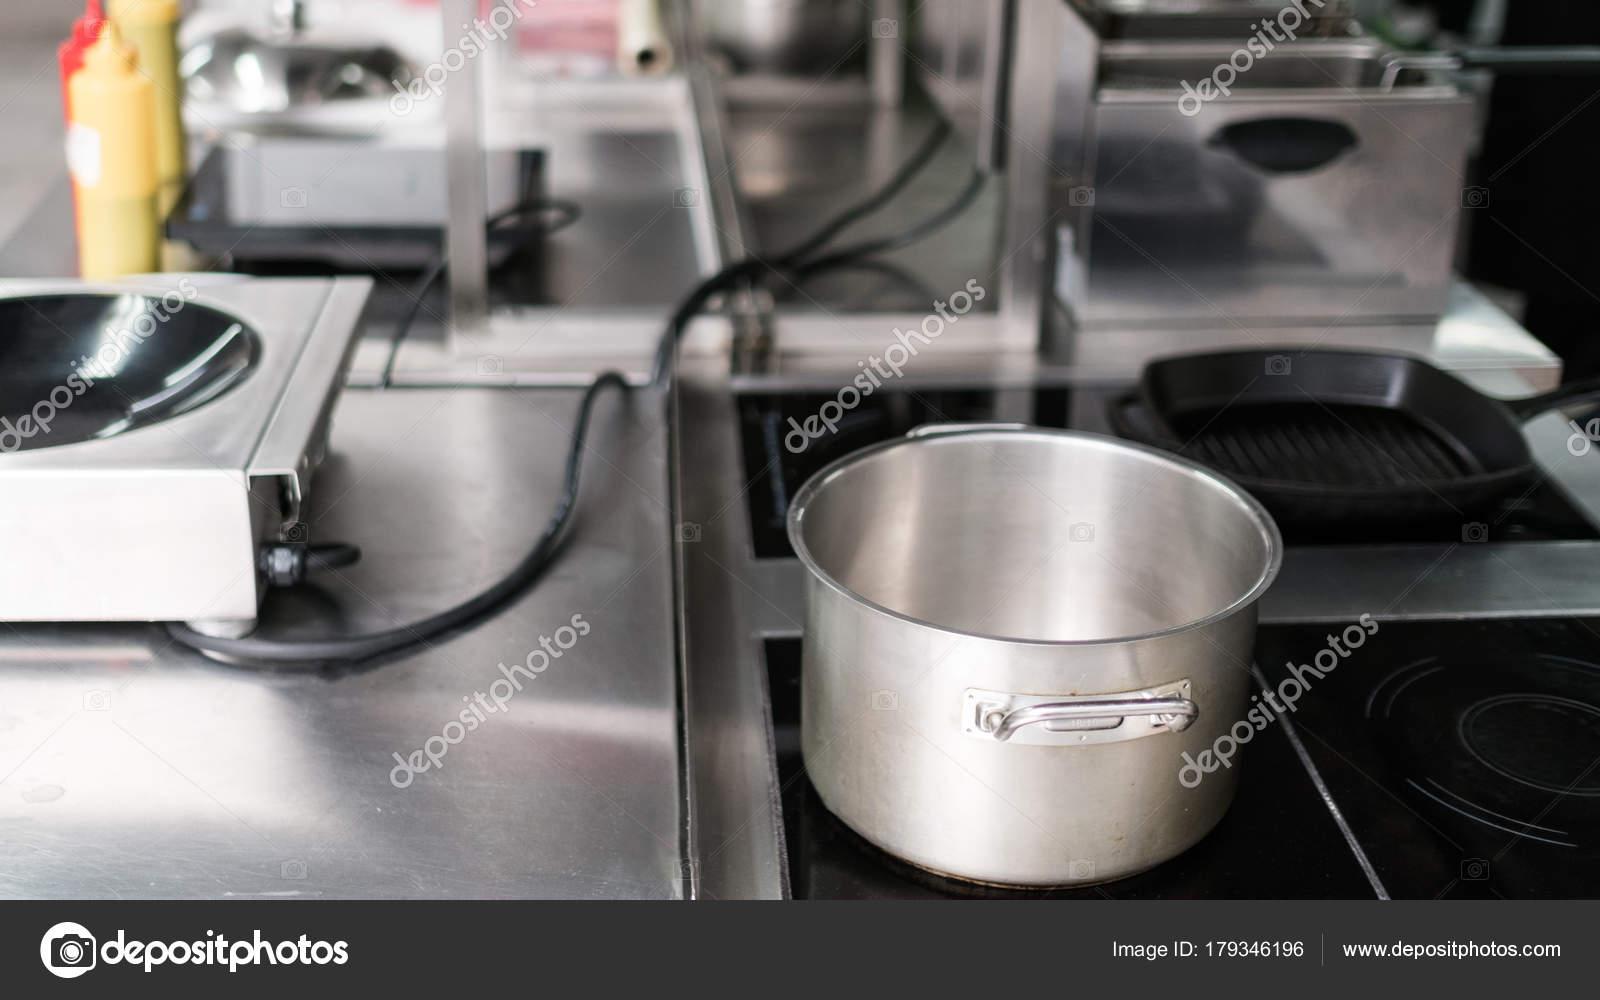 Pentola cucina utensili professionale del ristorante u foto stock